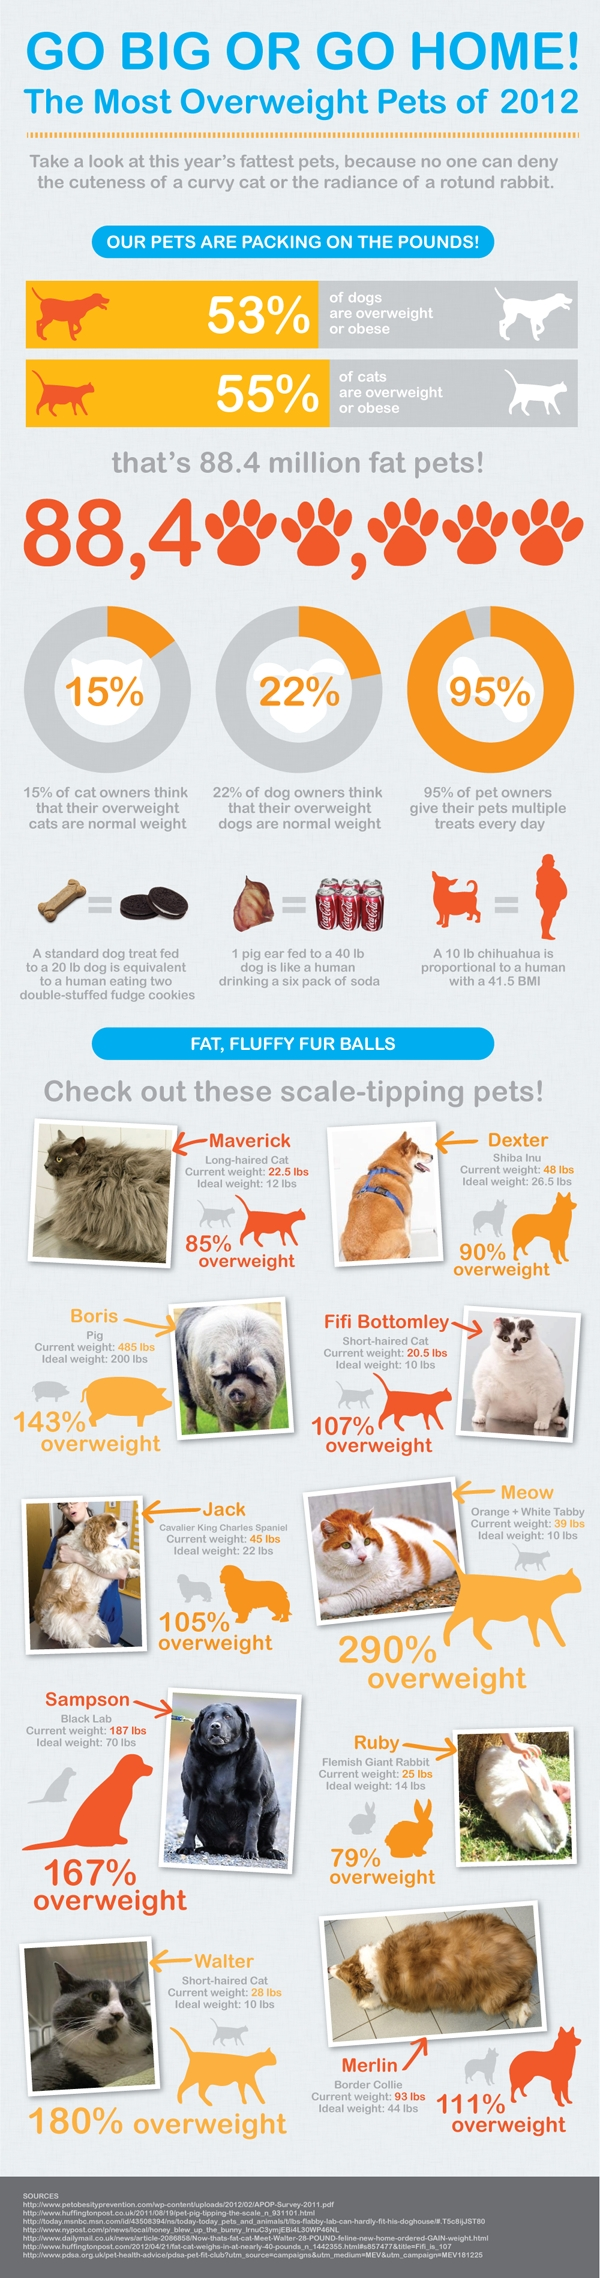 overweight pets statistics